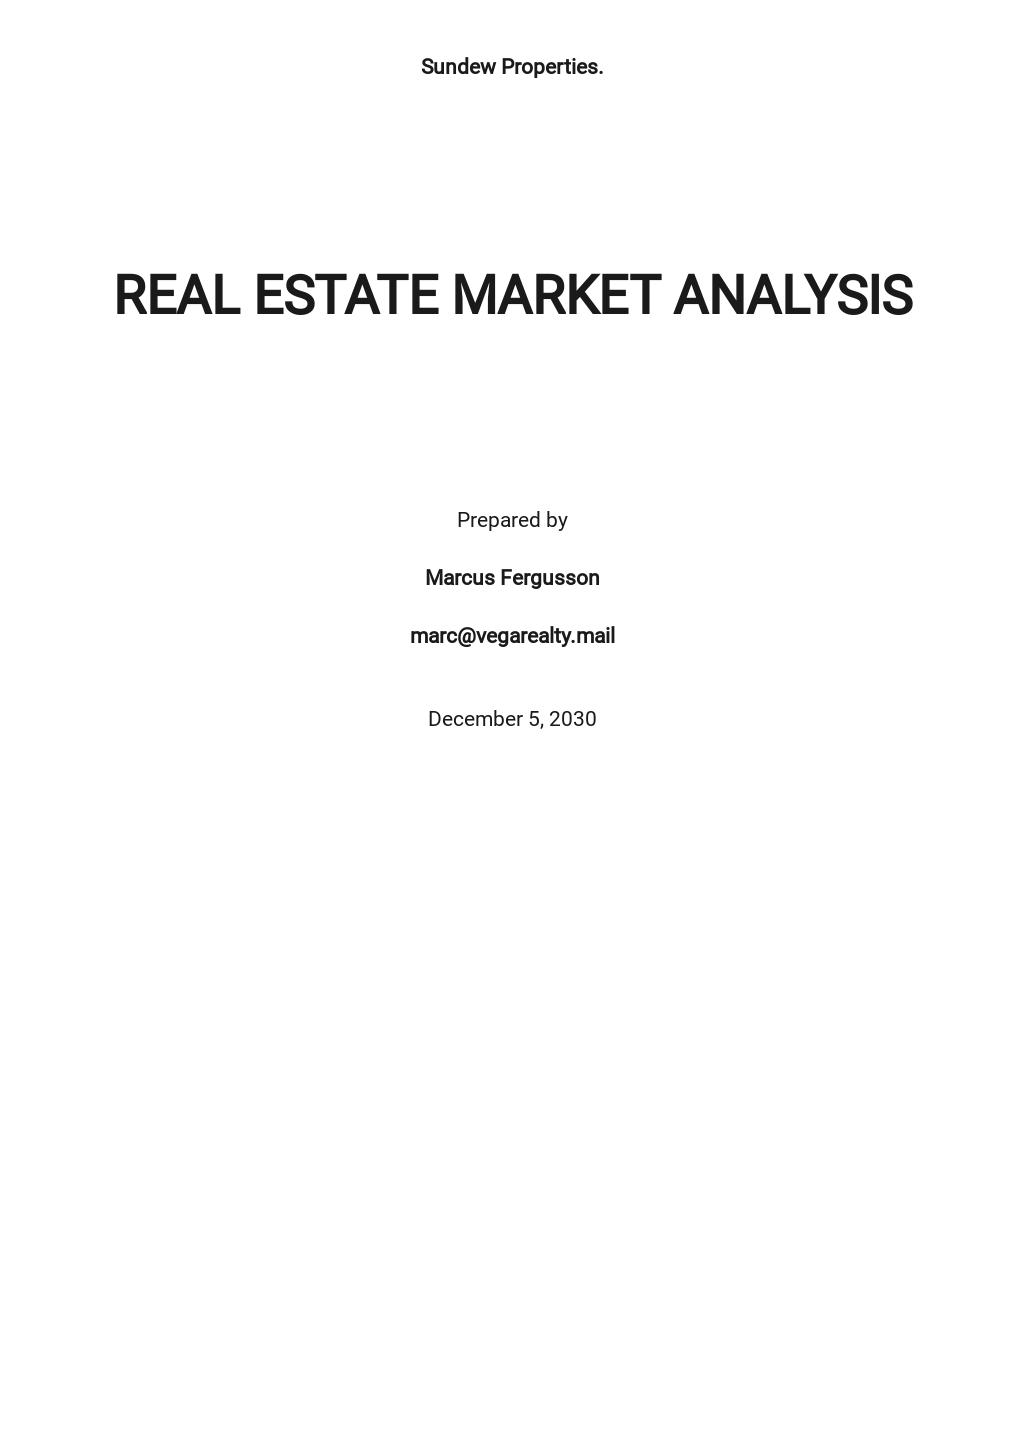 Real Estate Market Analysis Template.jpe